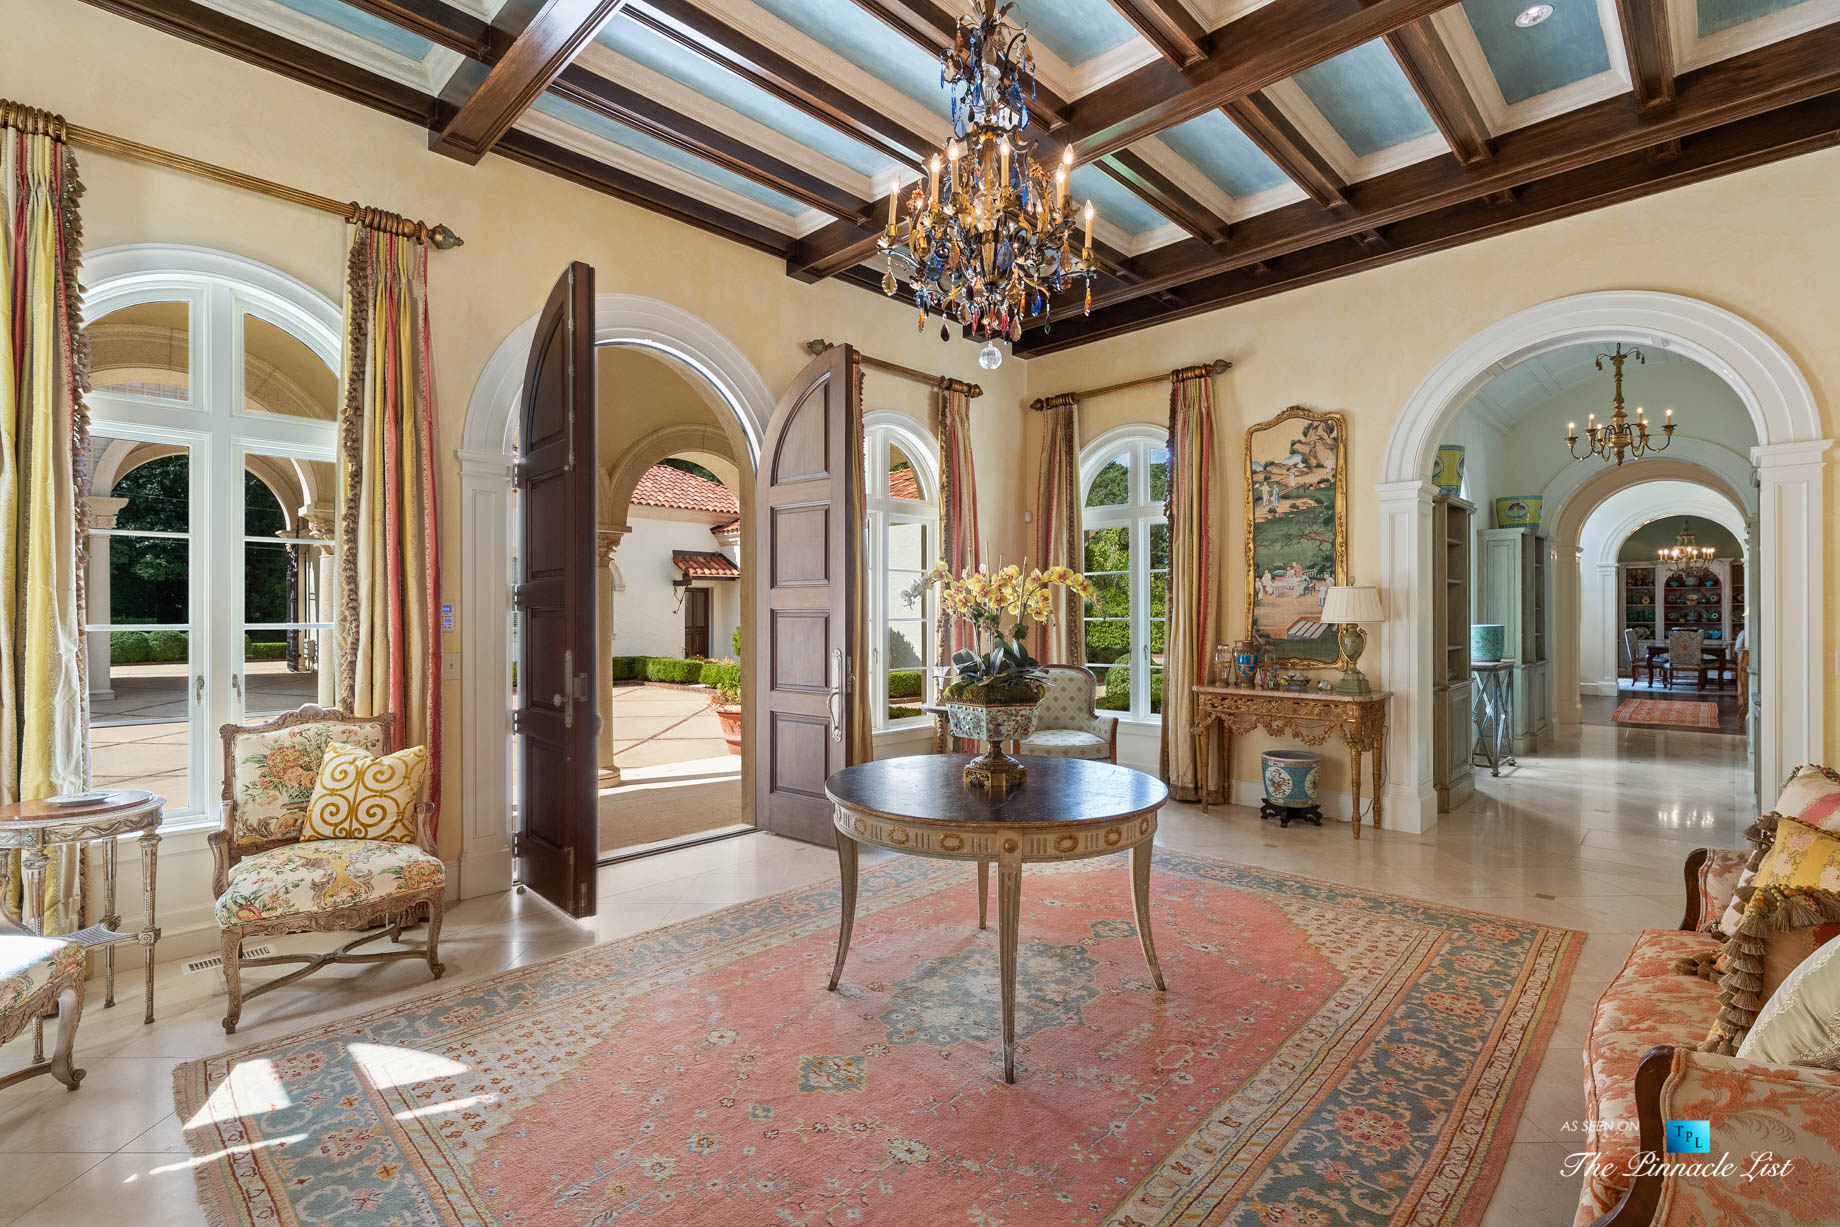 439 Blackland Rd NW, Atlanta, GA, USA - Sitting Area - Luxury Real Estate - Tuxedo Park Mediterranean Mansion Home